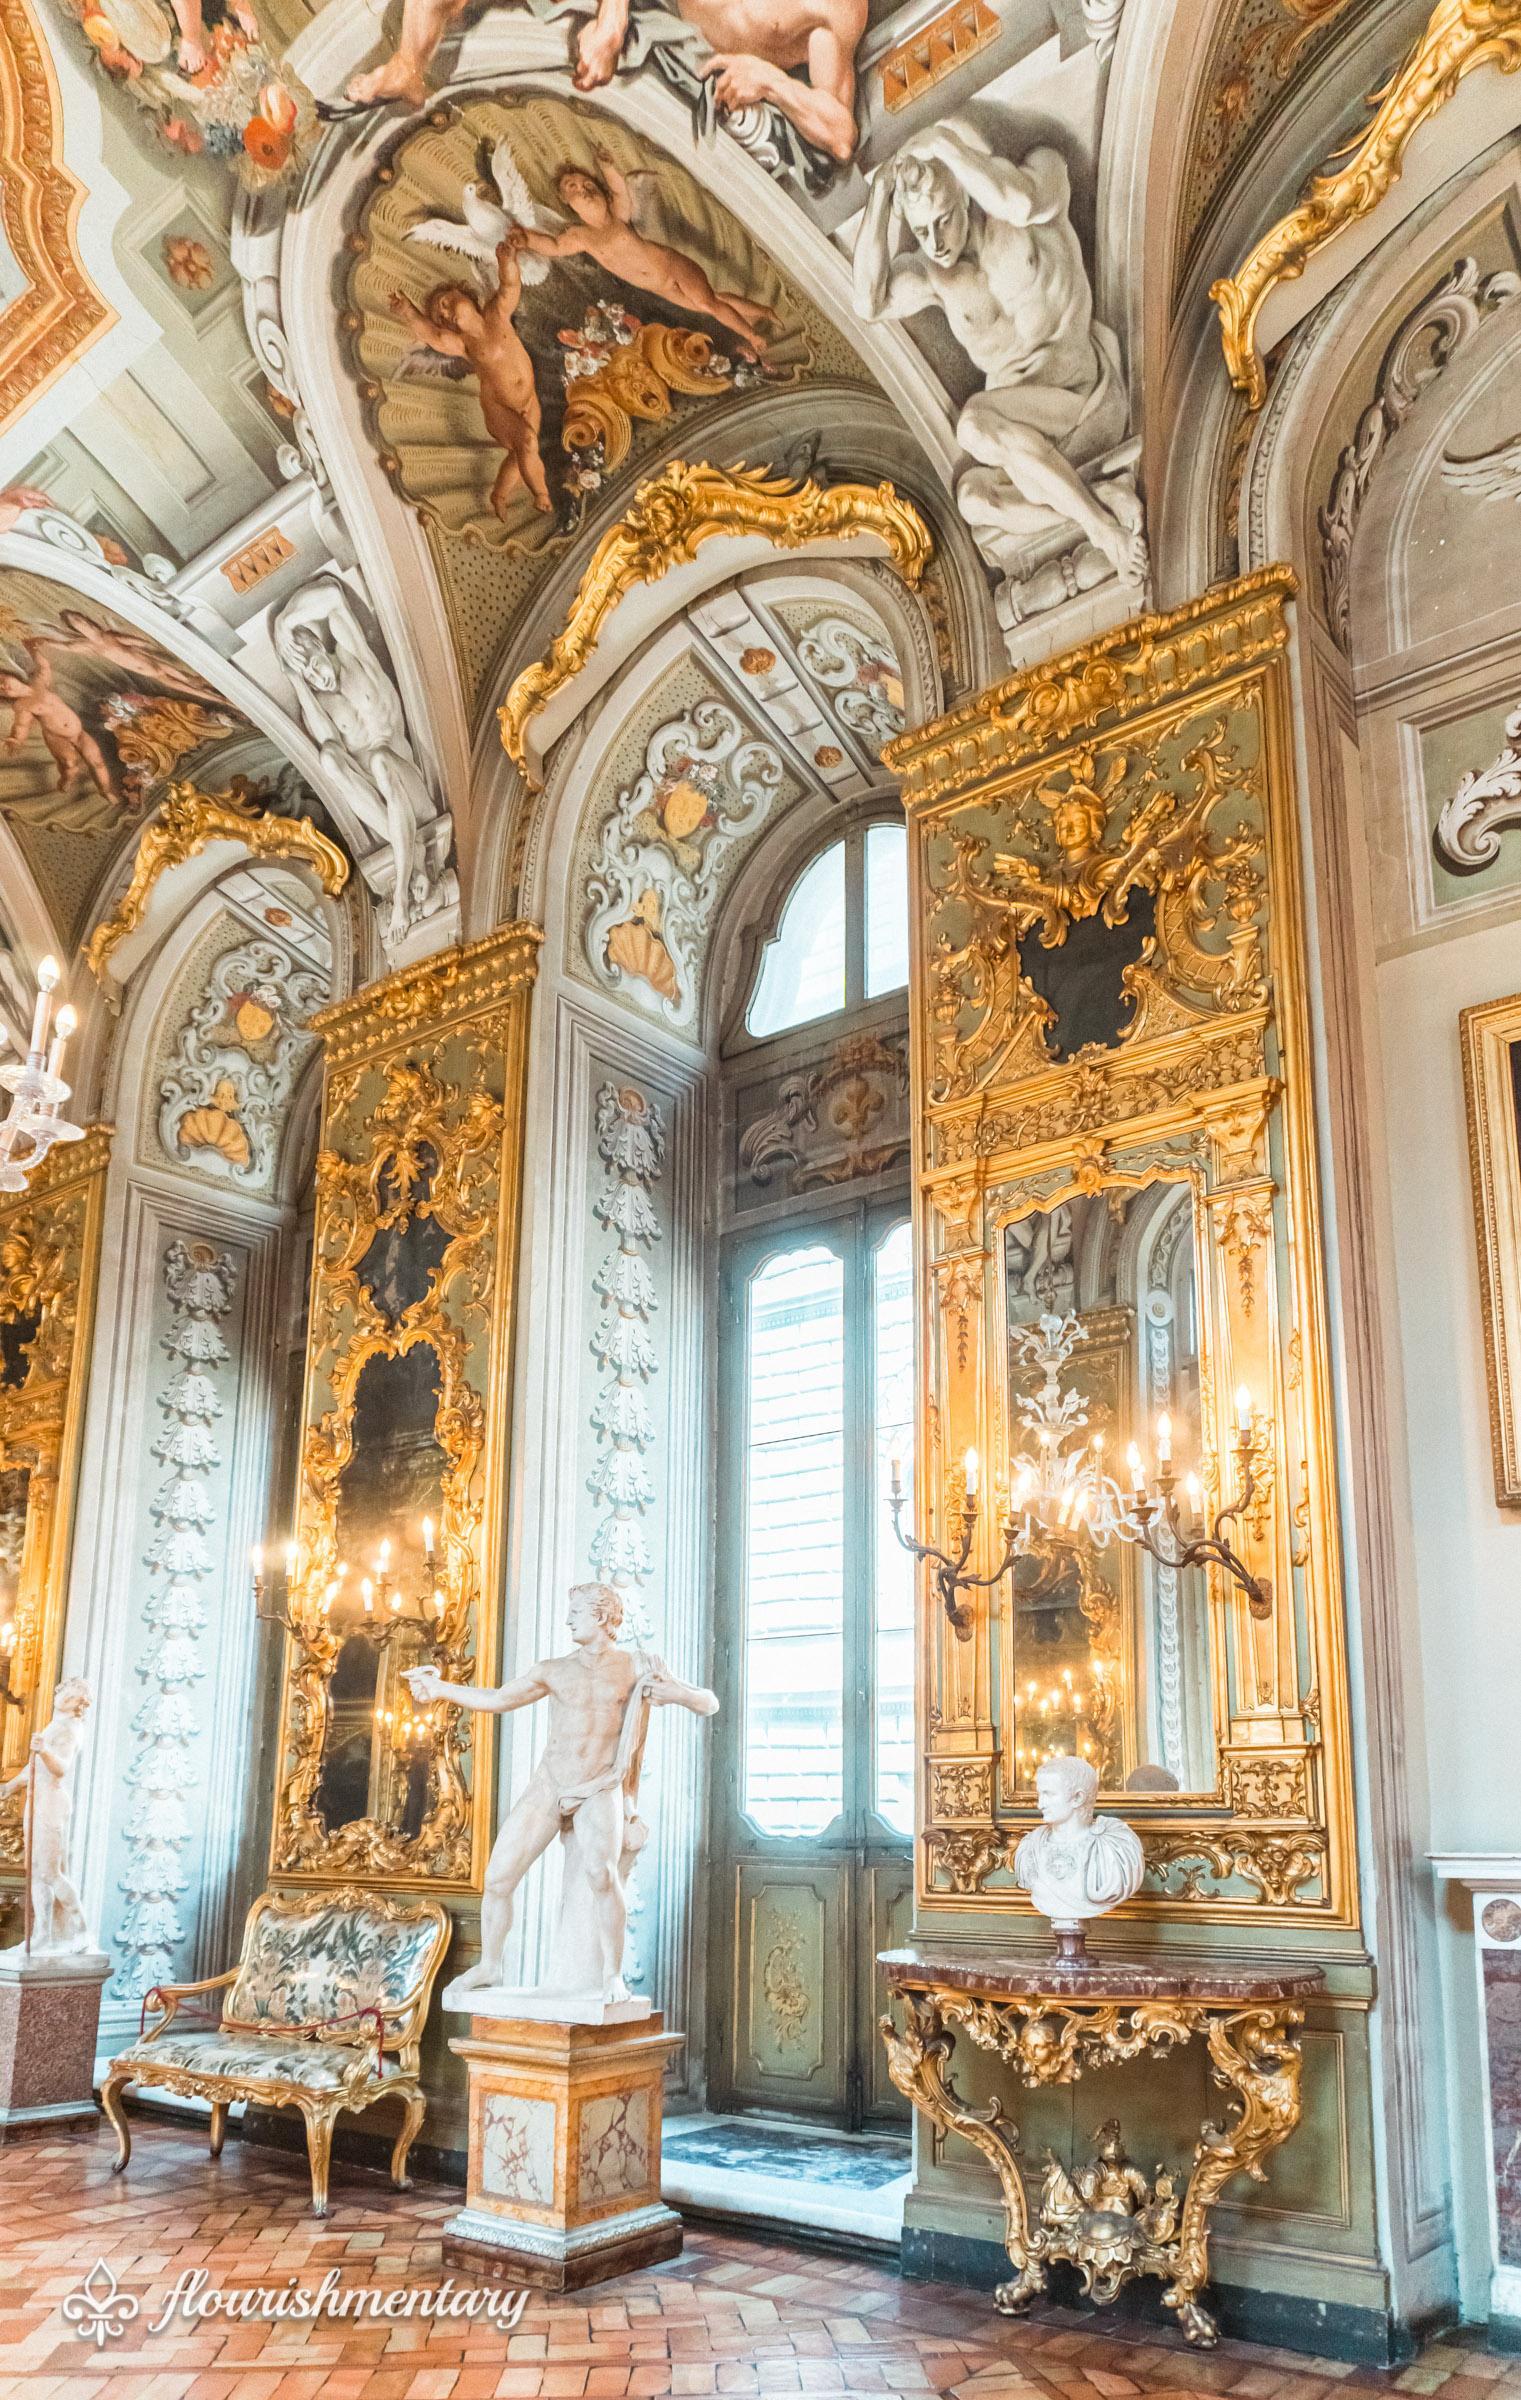 Galleria Doria Pamphilj hall of mirrors and art